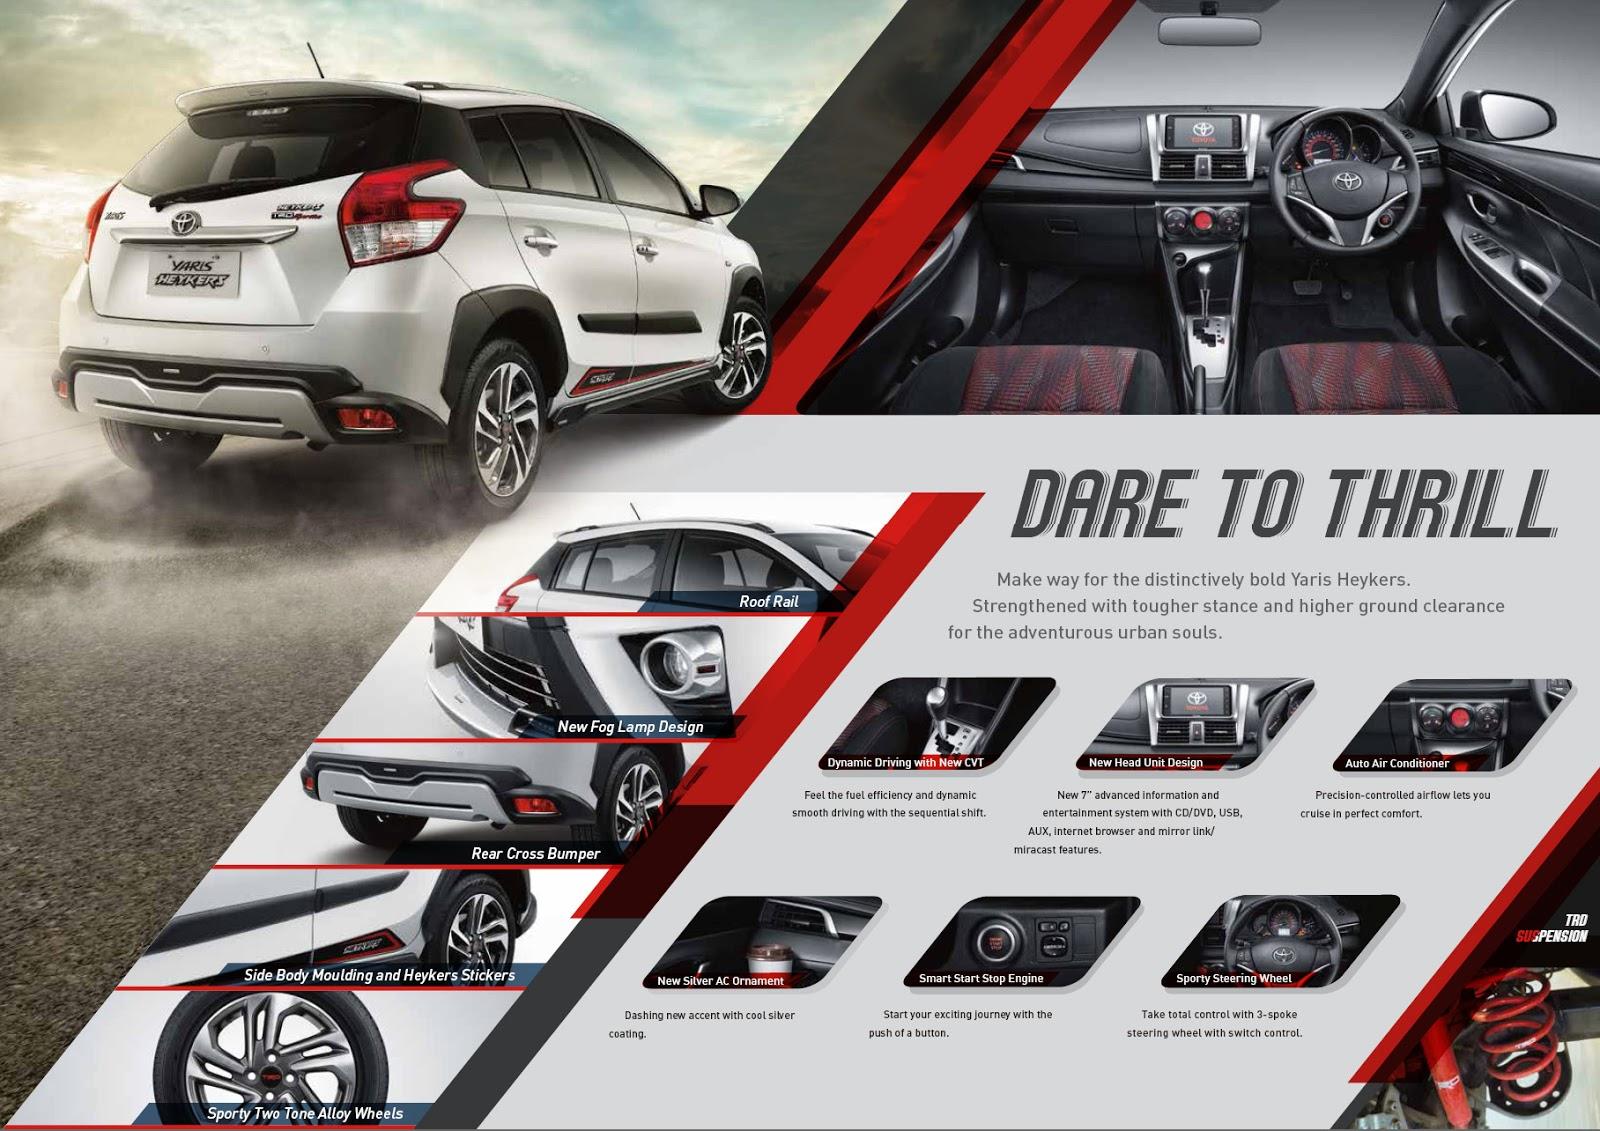 Toyota Yaris Trd Heykers Harga Mobil All New Vellfire Brosur 2017 Calya Agya Avanza